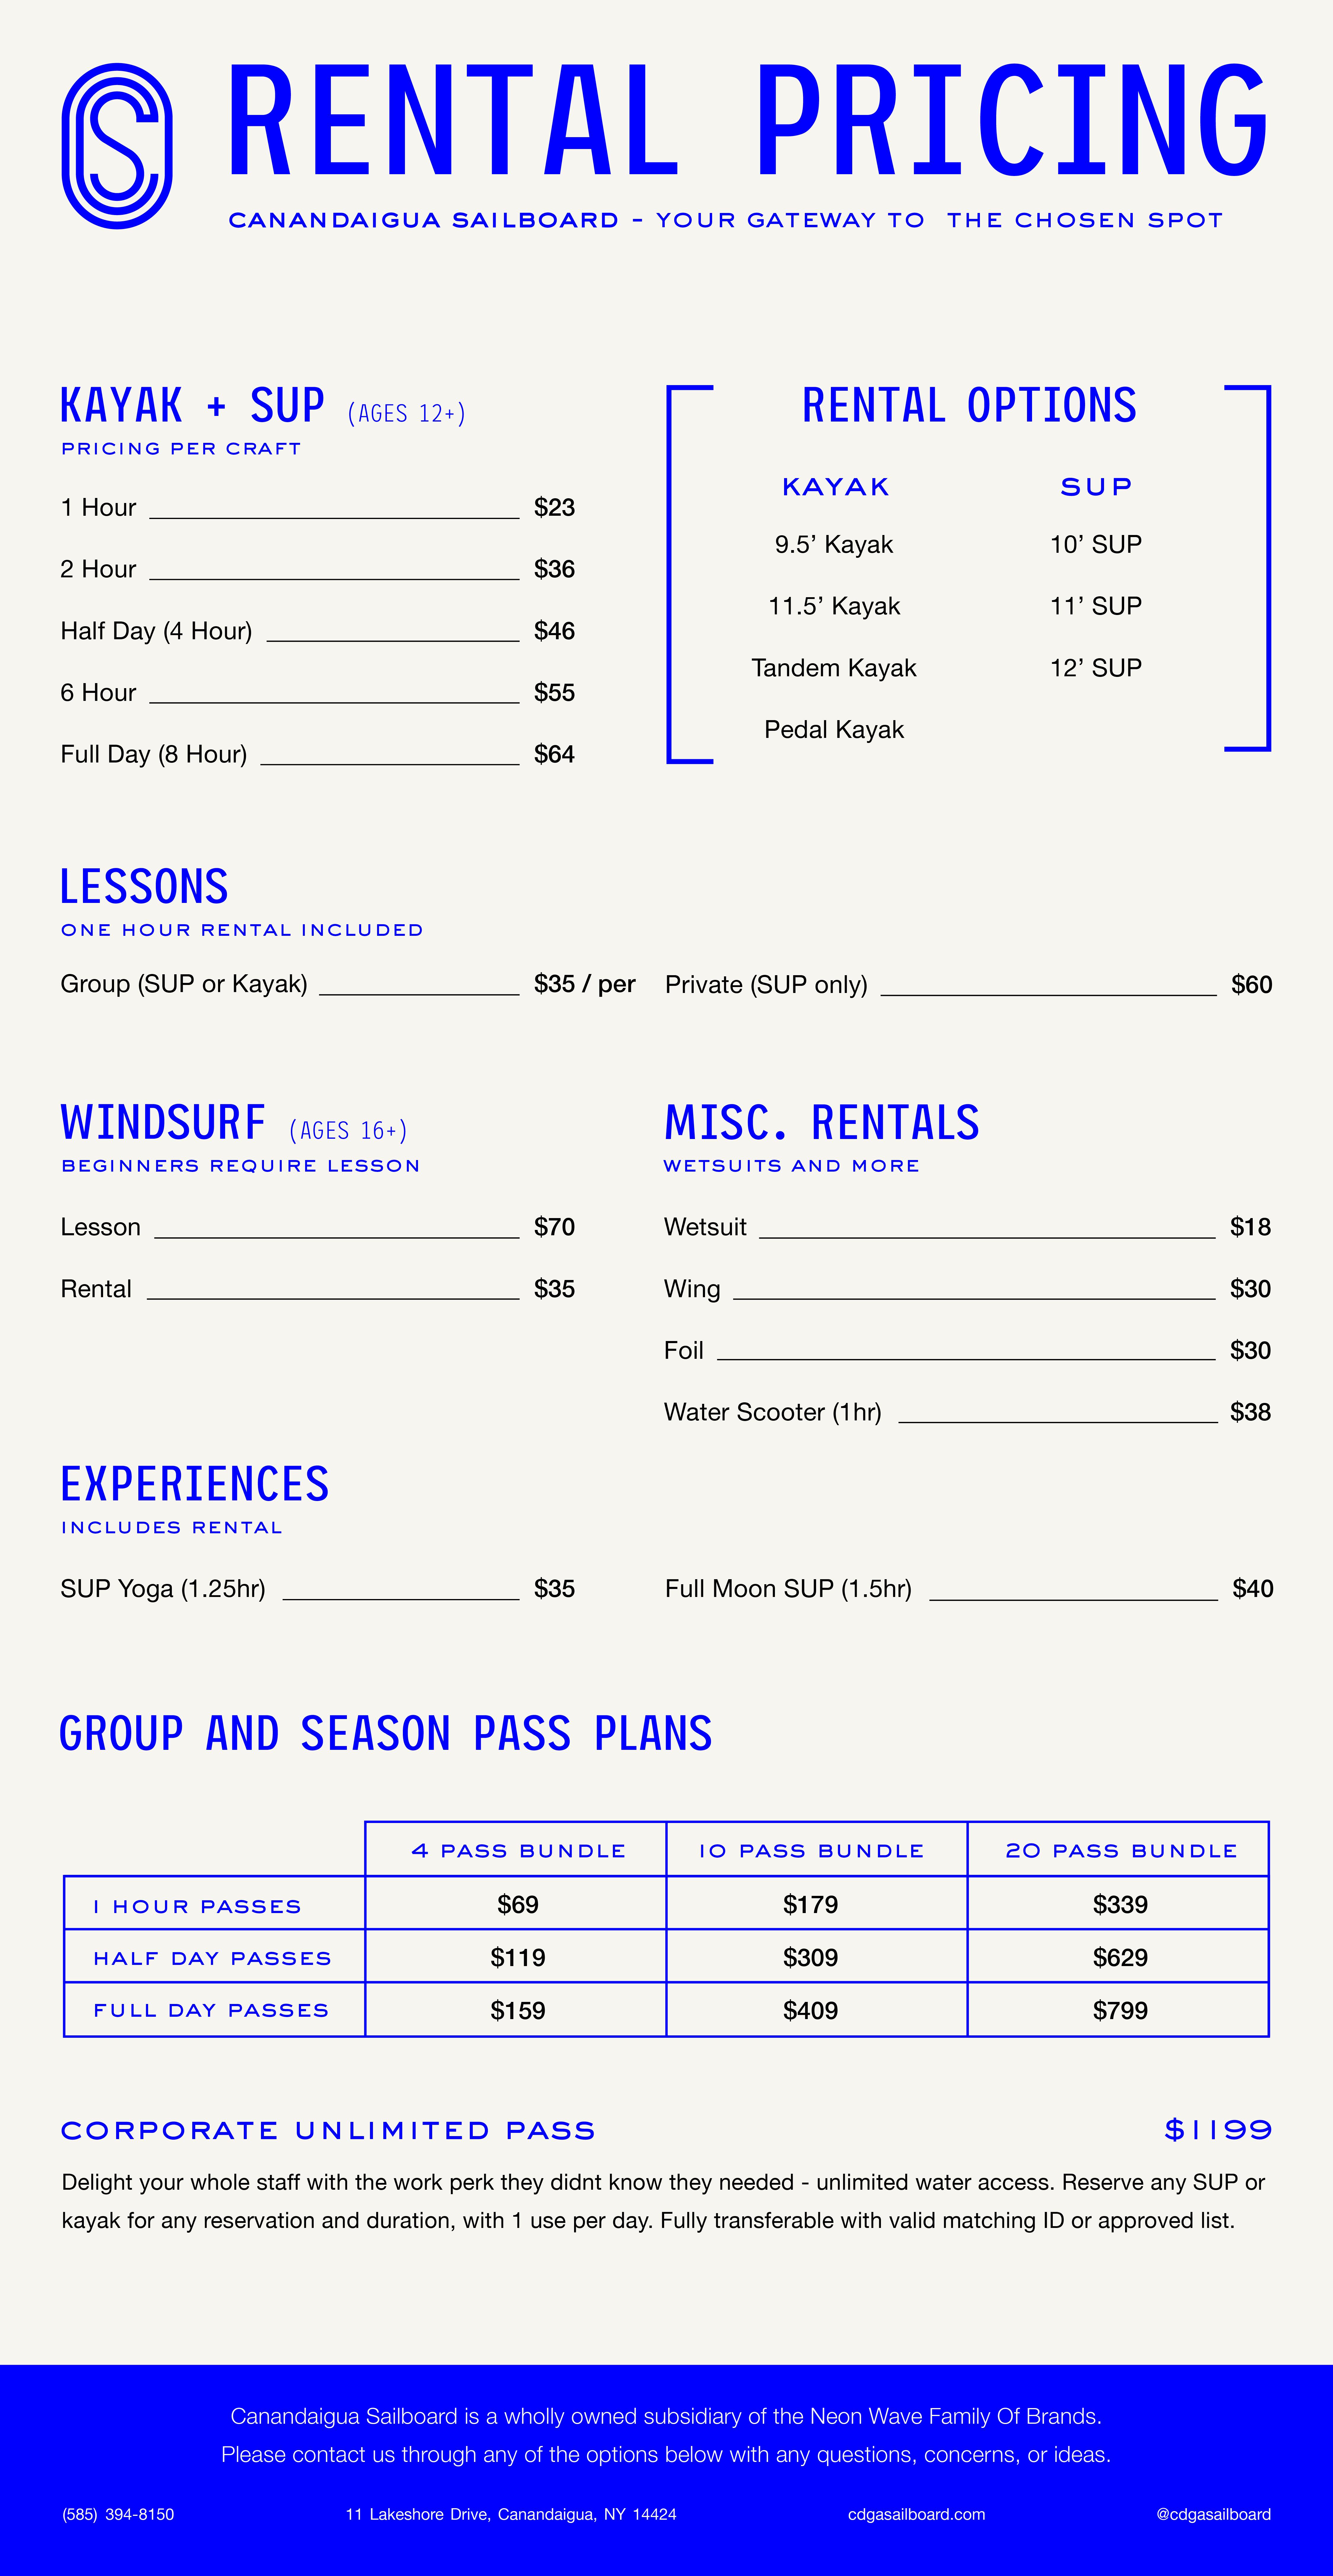 Canandaigua Sailboard Pricing